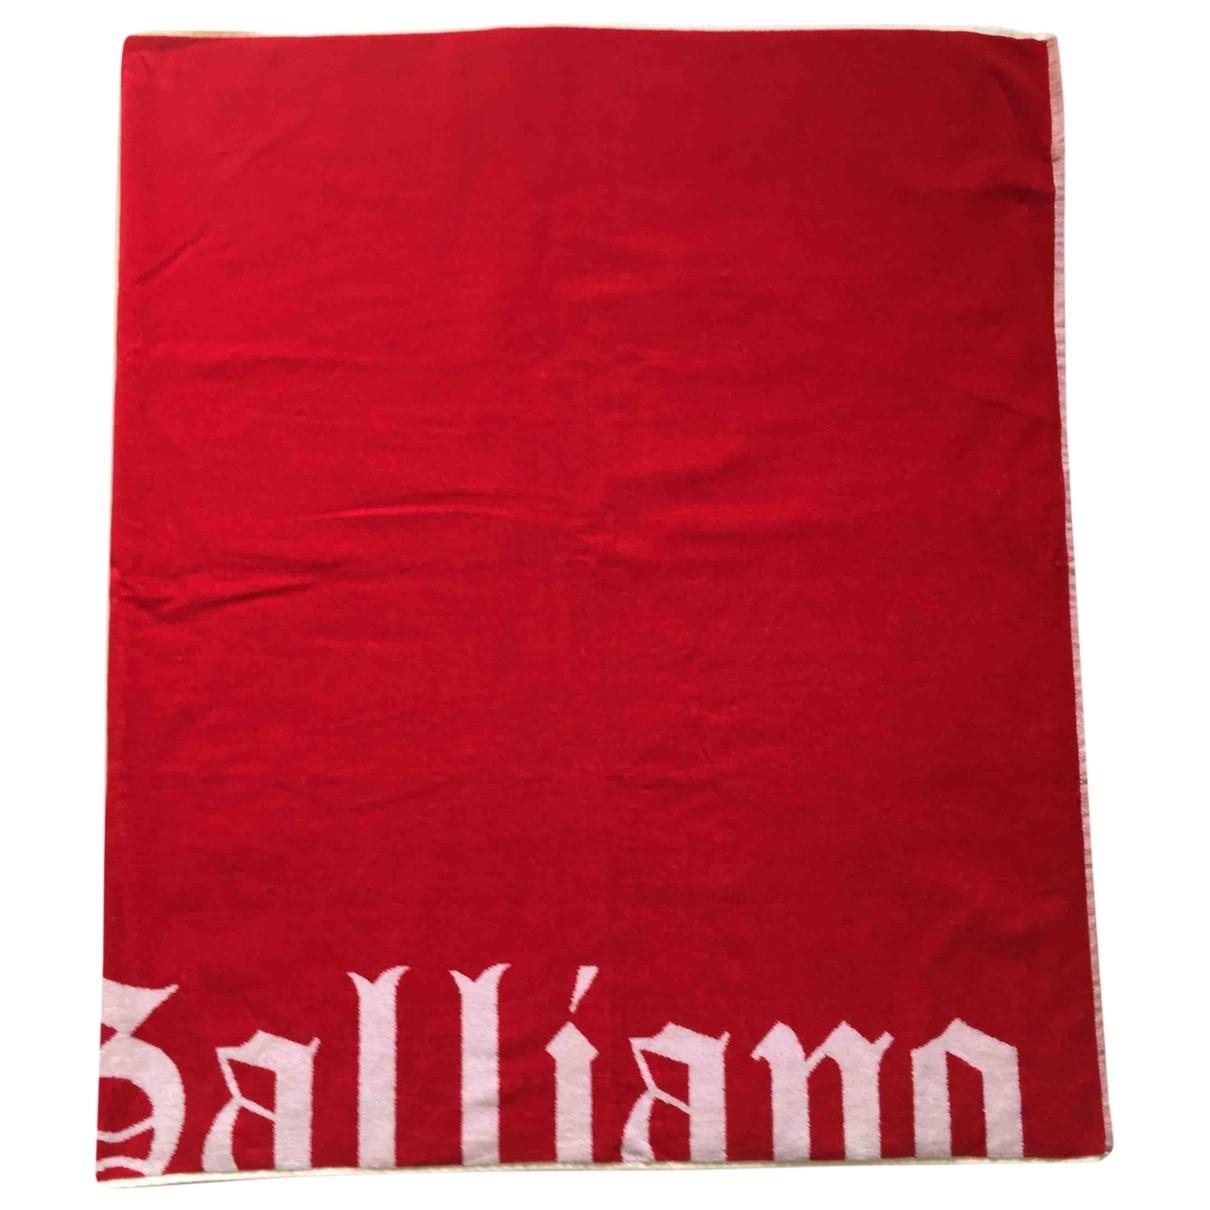 Textil de hogar John Galliano